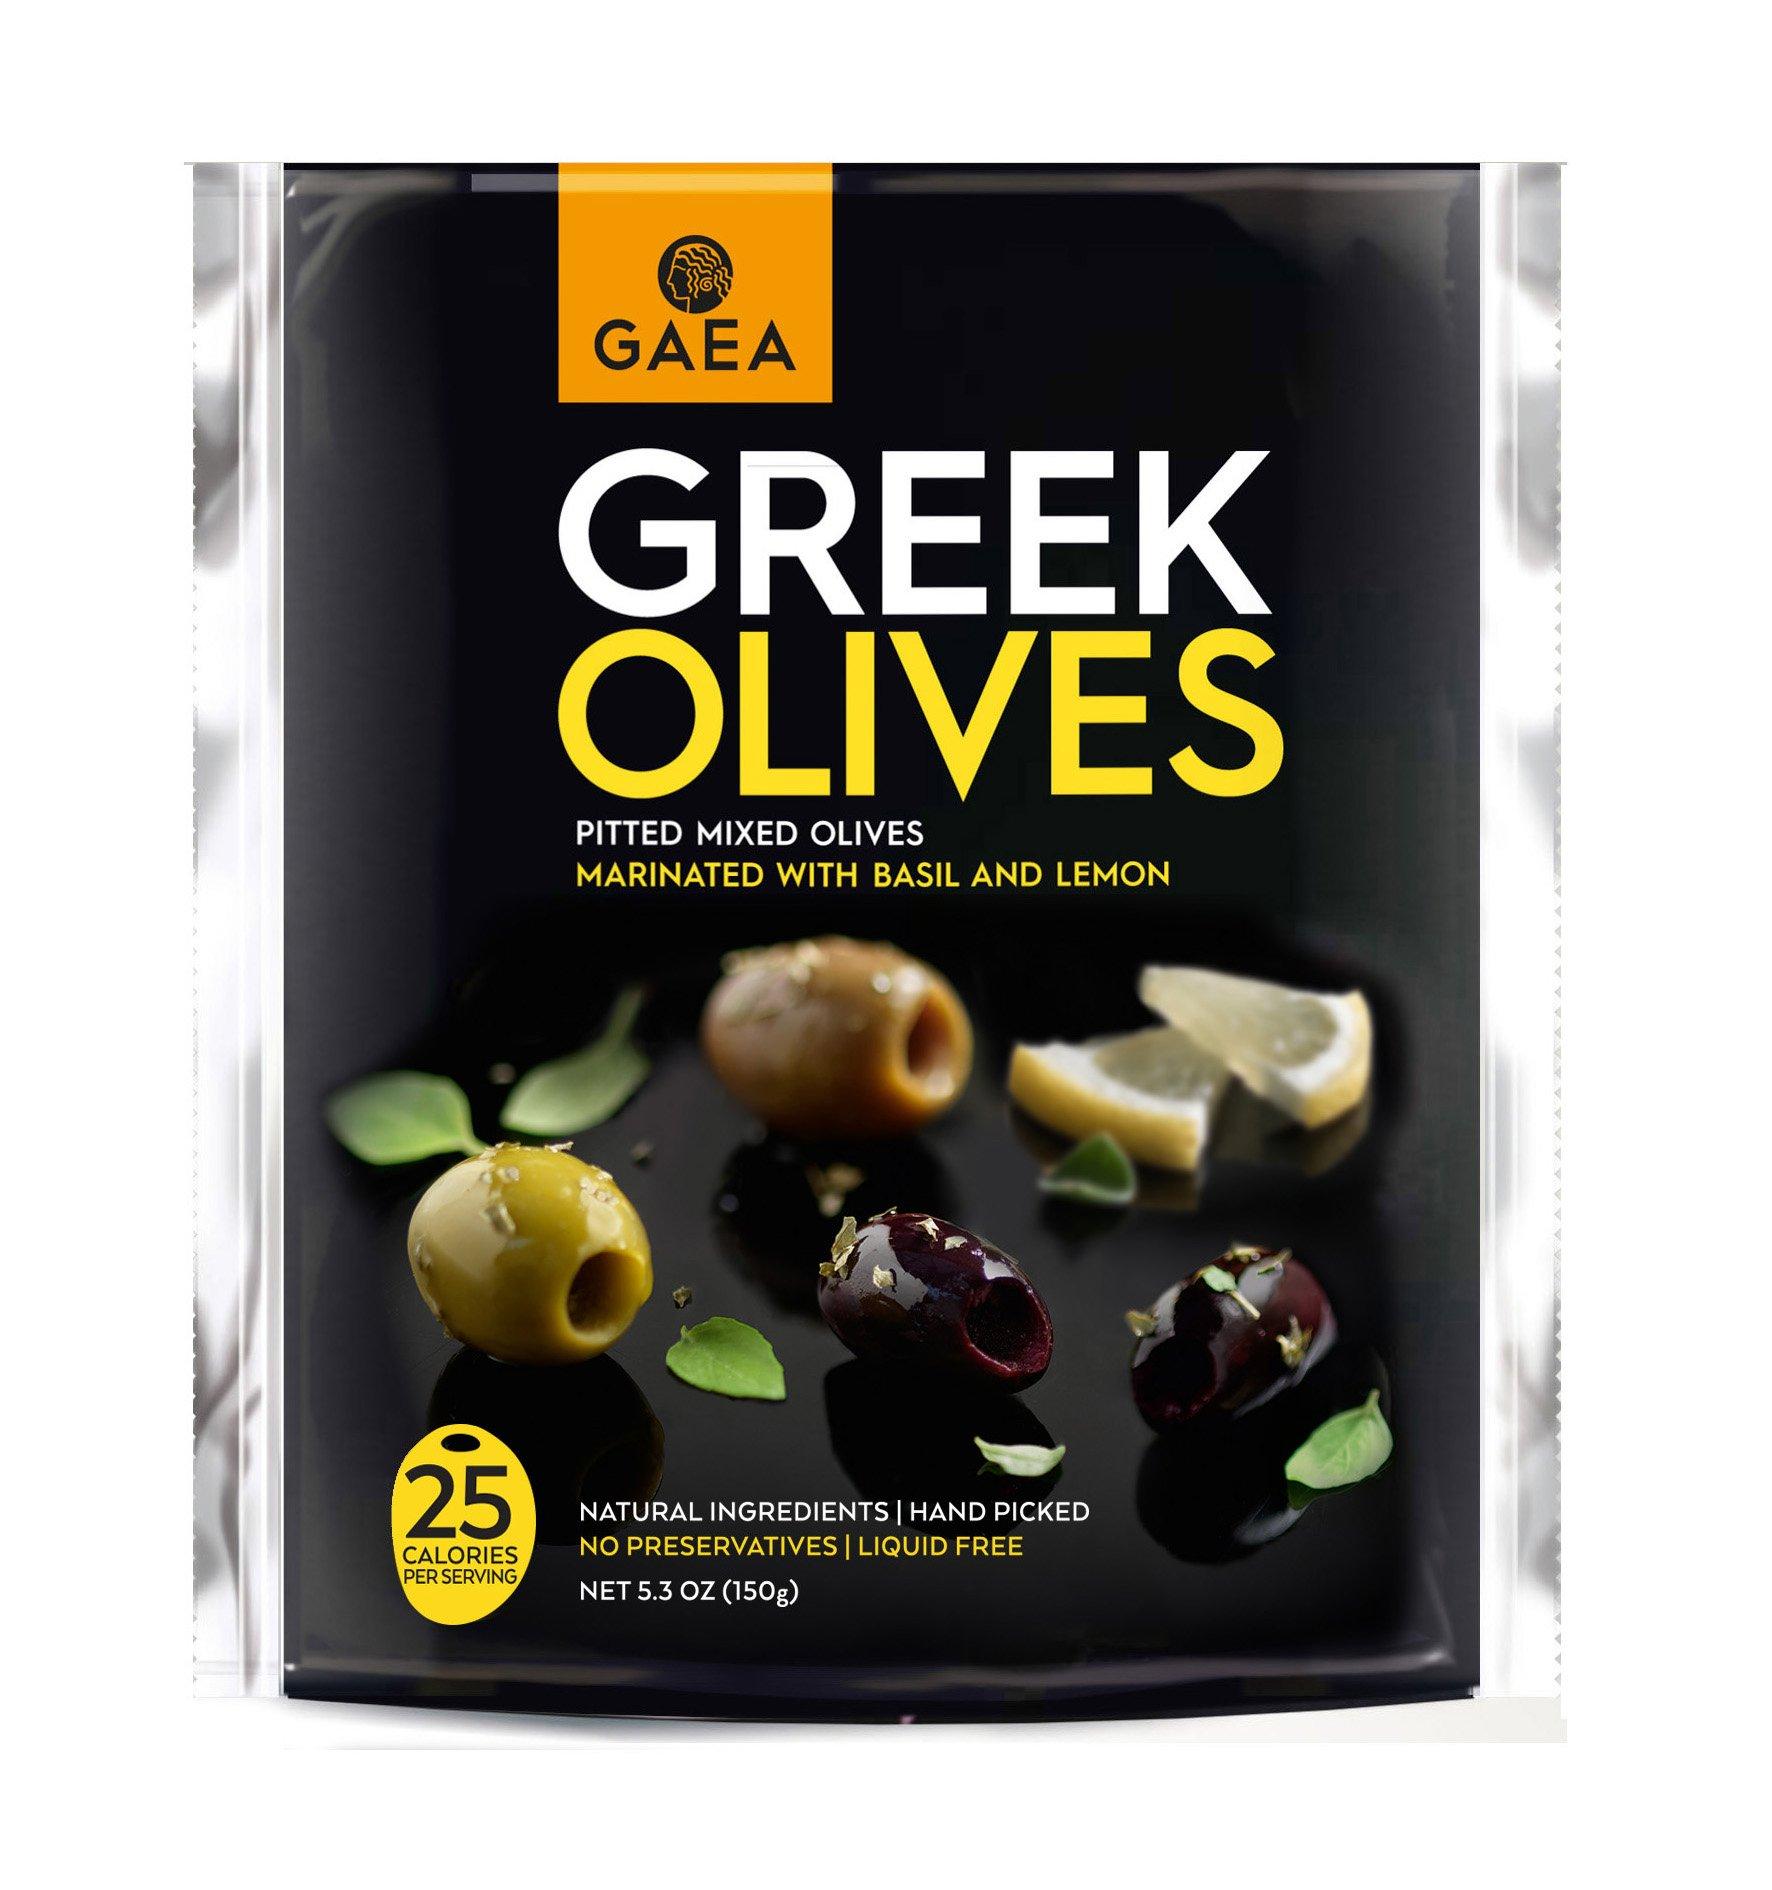 Gaea Mixed Olives with Basil & Lemon Juice Snack Packs - 5.3 oz (Pack of 8)